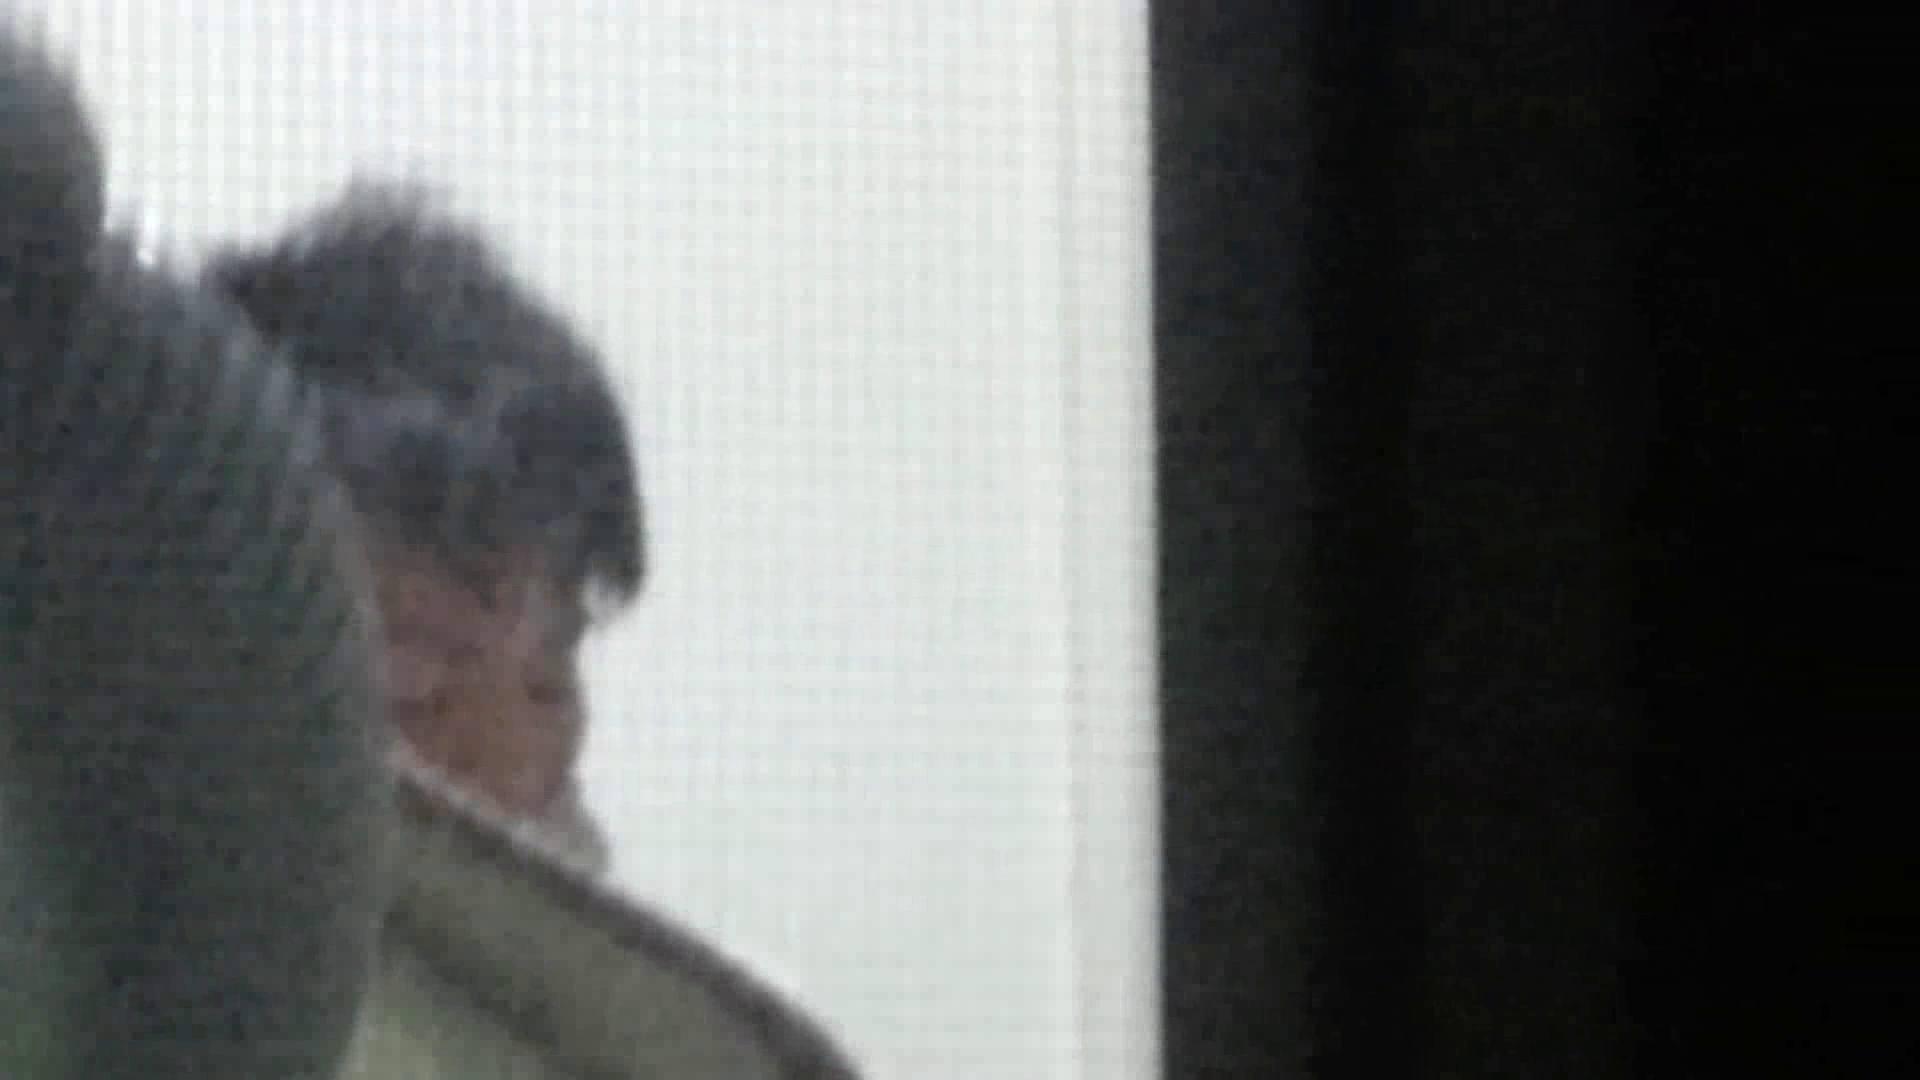 SPYさん初投稿!マンション覗き!5000K!ハイビジョン撮影VOL.05(元サッカー部員社会人) 念願の完全無修正 ゲイアダルト画像 75連発 13